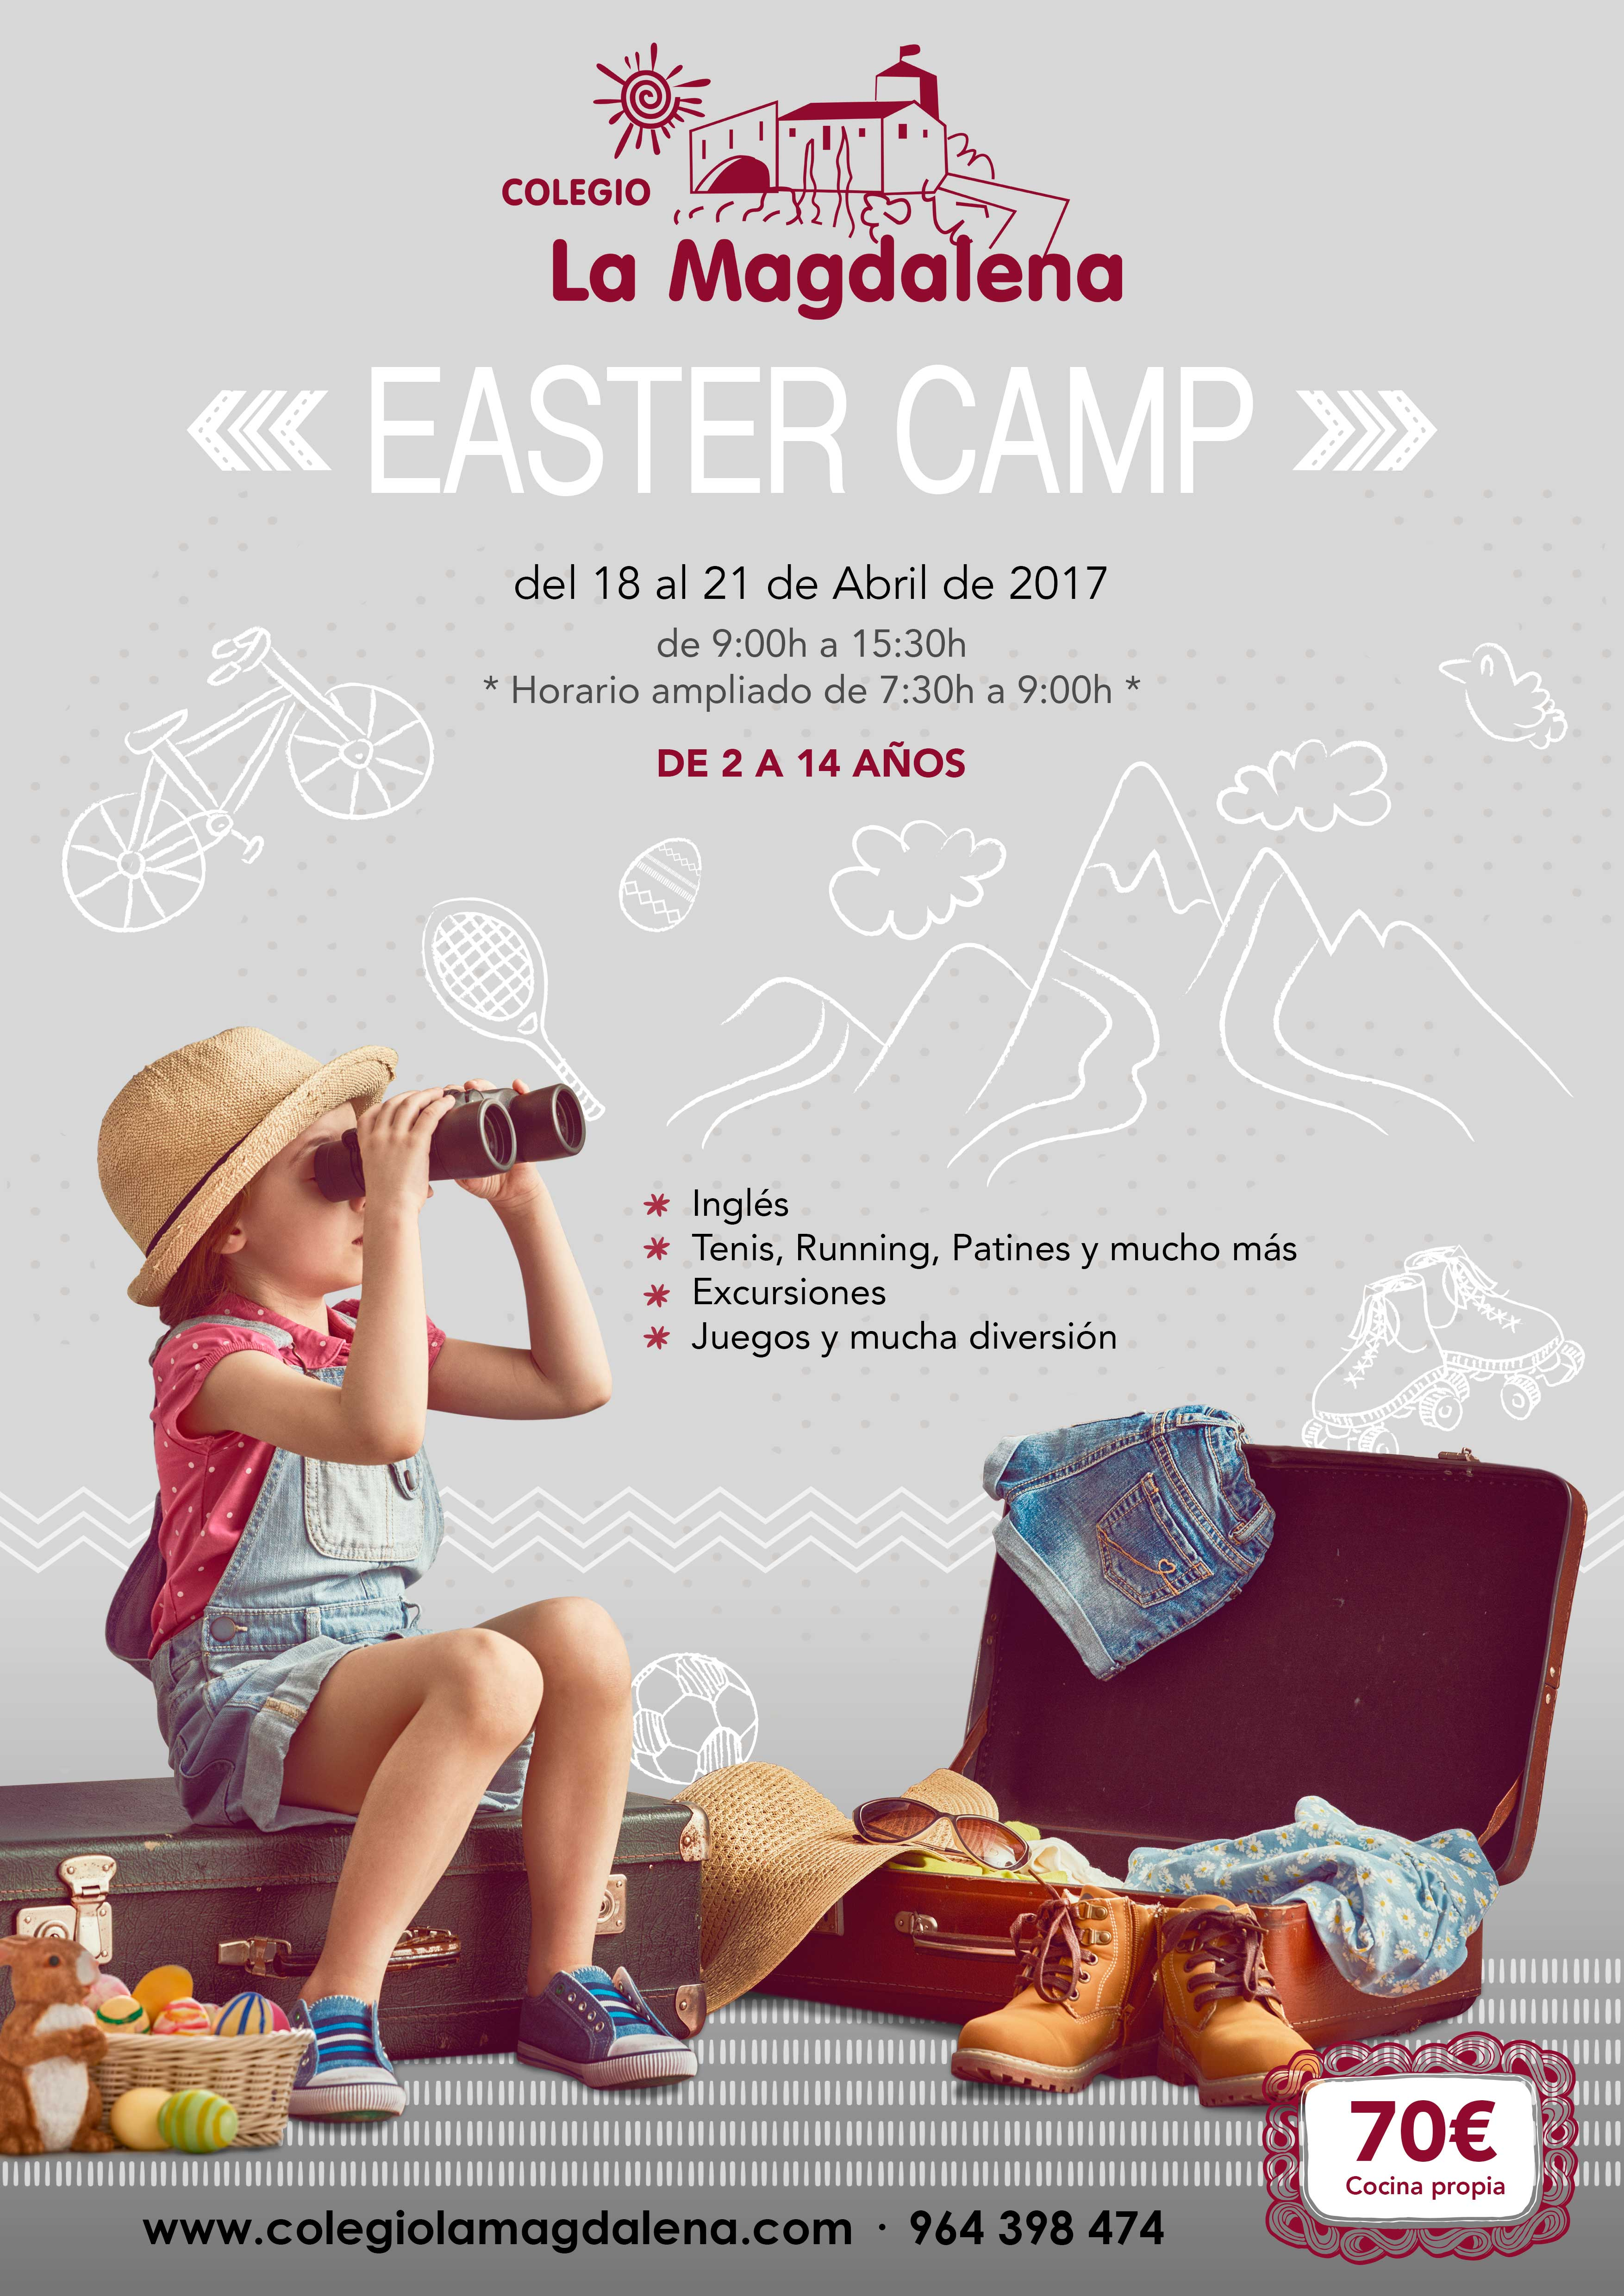 LaMagdalena_EasterCamp2017